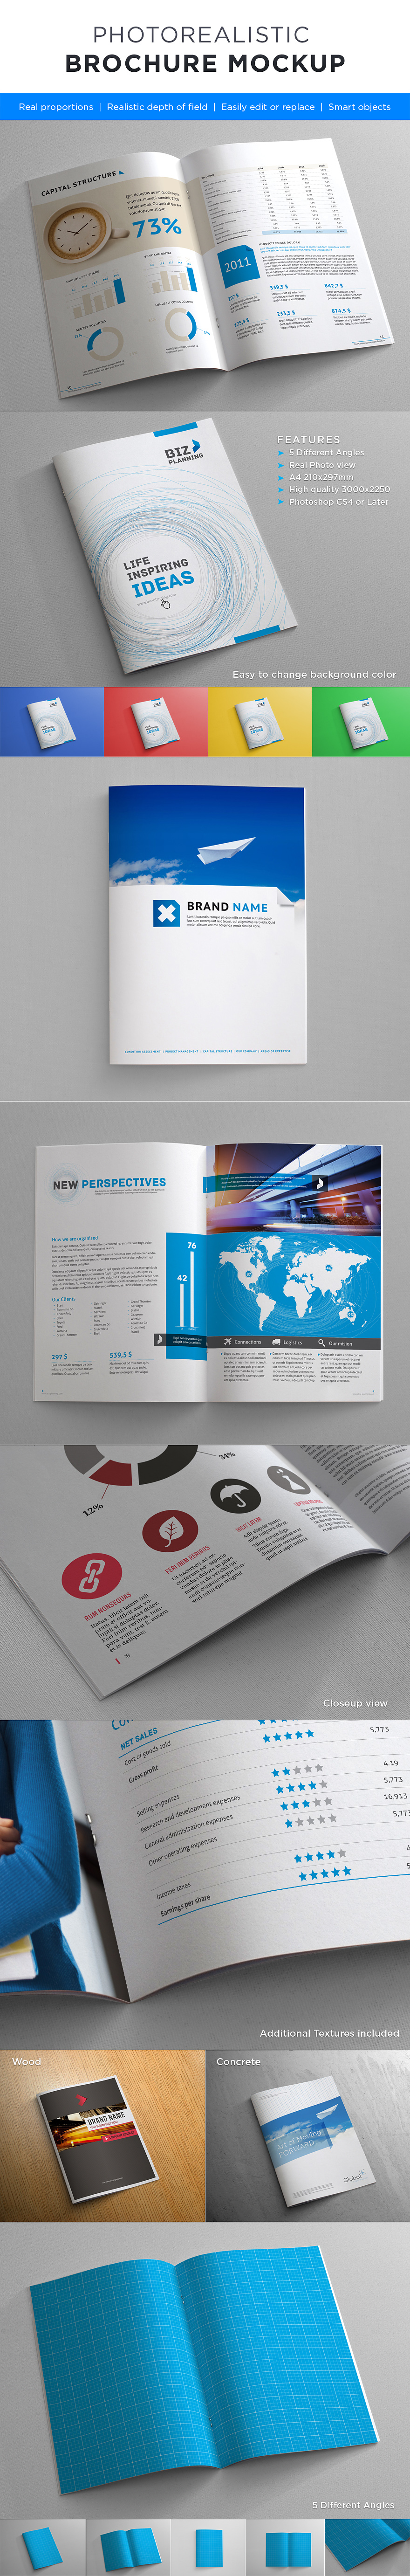 Photorealistic Brochure Mock Up Brochure Design Brochure Design Inspiration Brochure